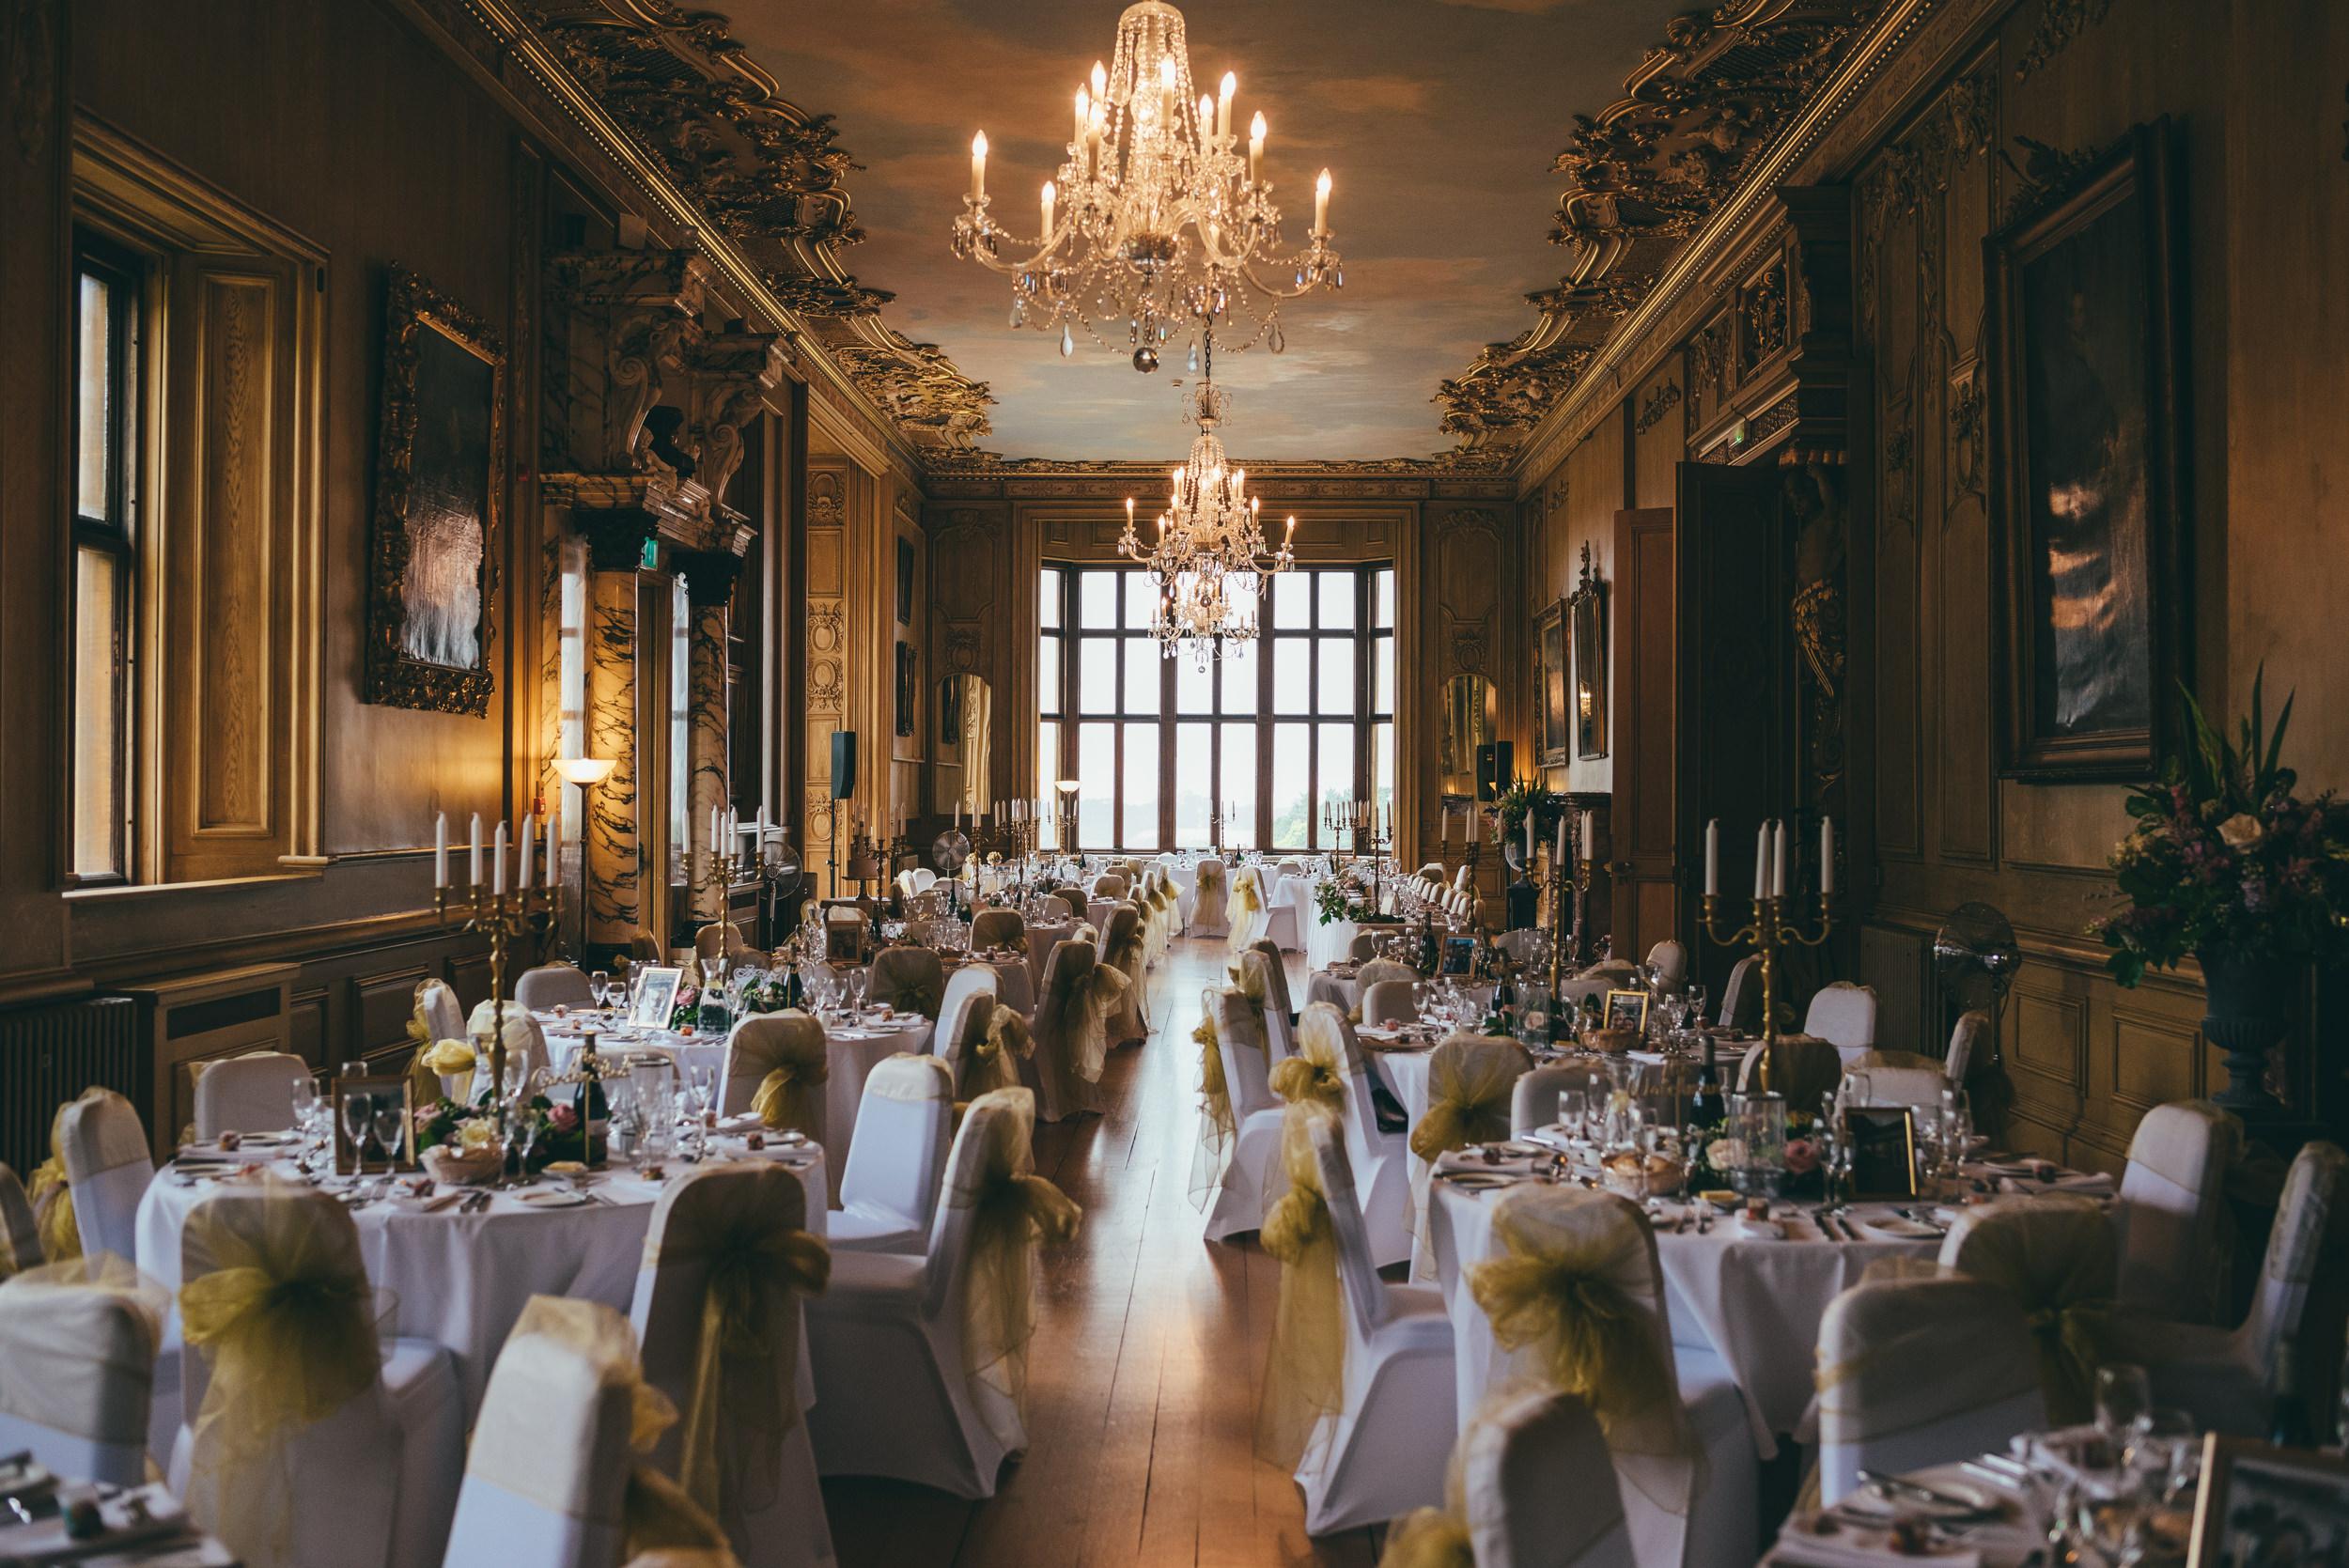 Wedding day reception room at Harlaxton Manor